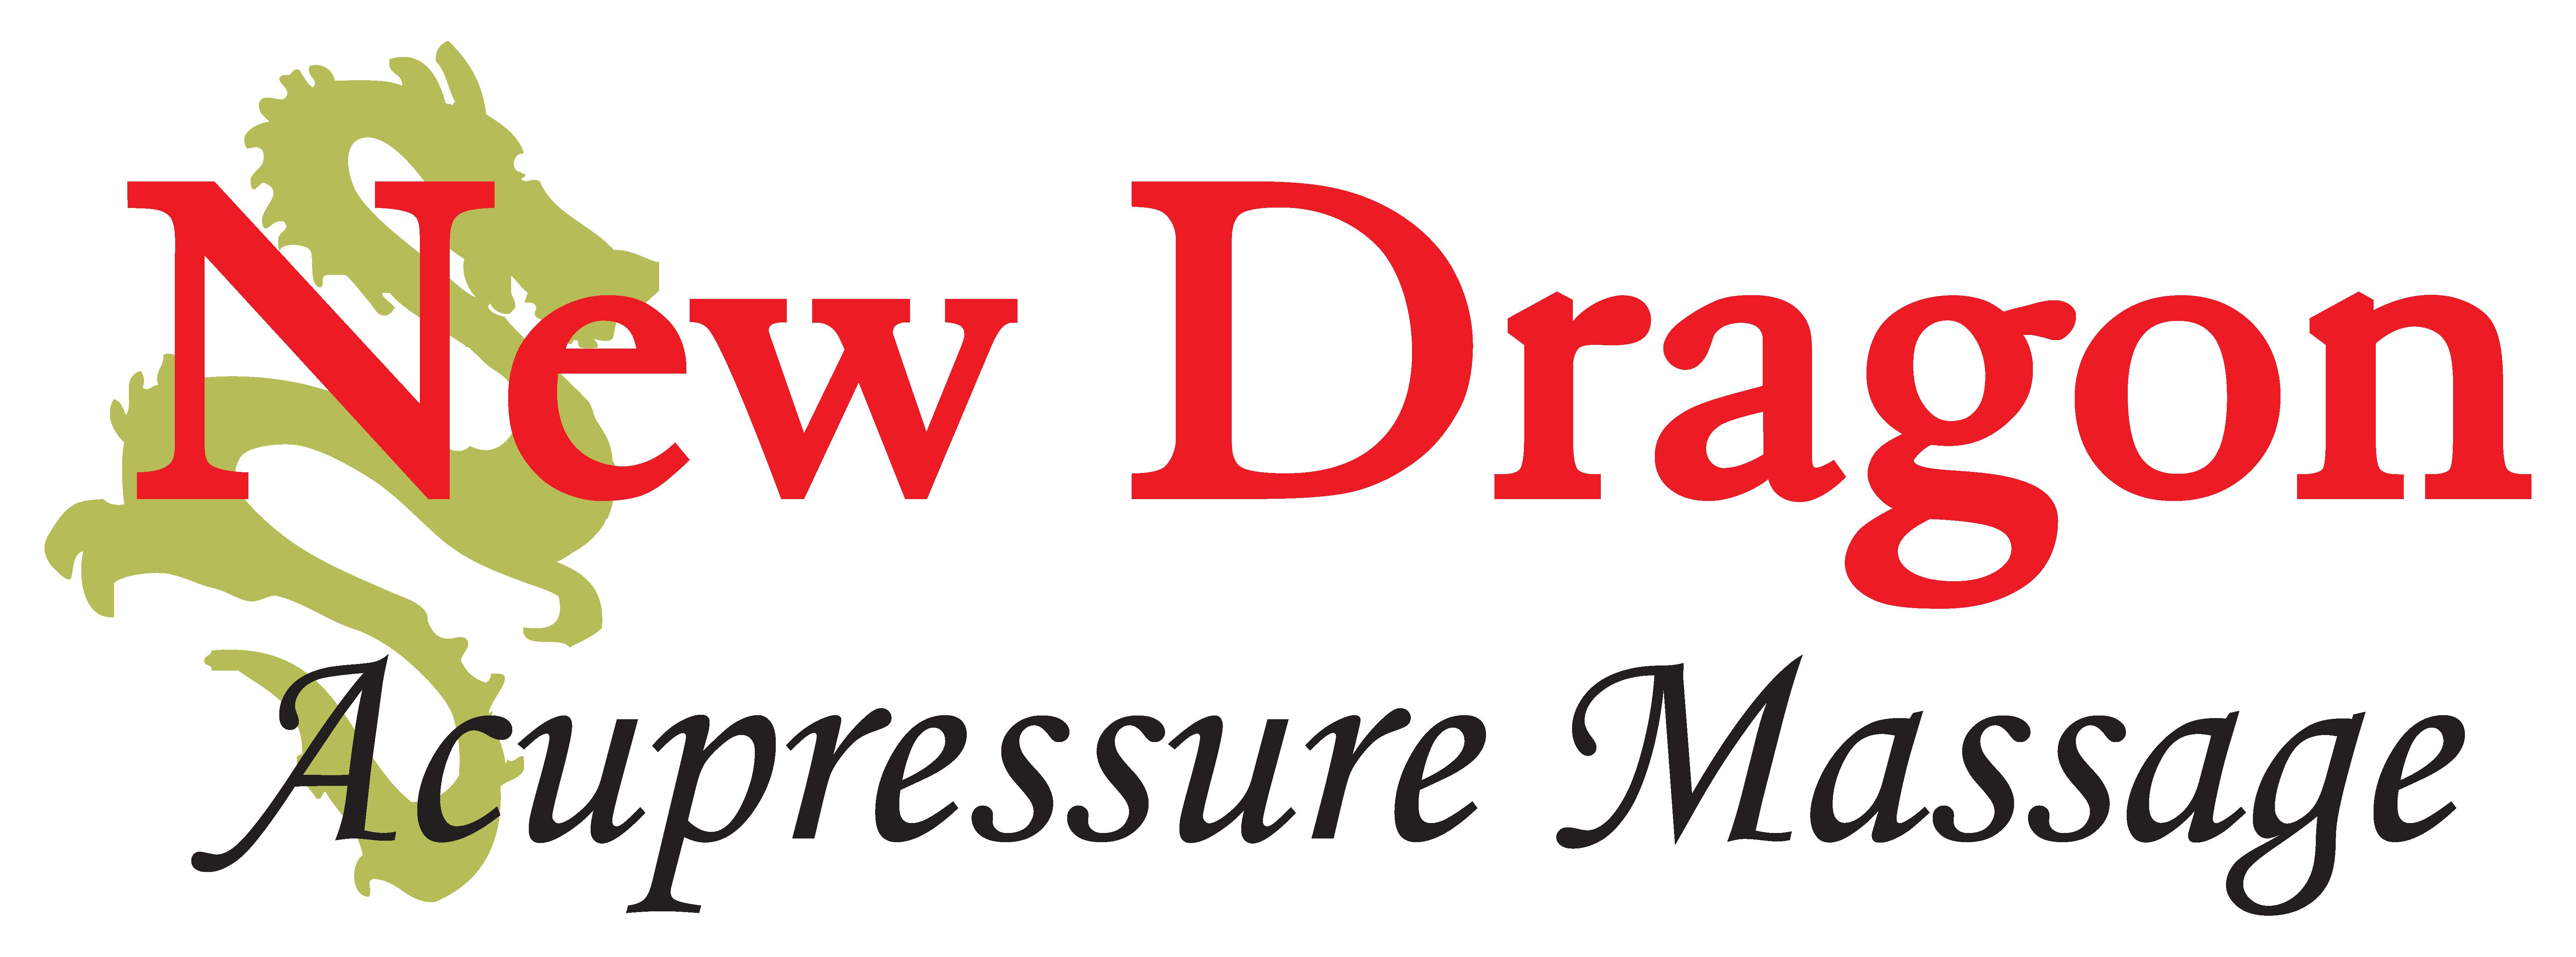 New Dragon Acupressure Massage